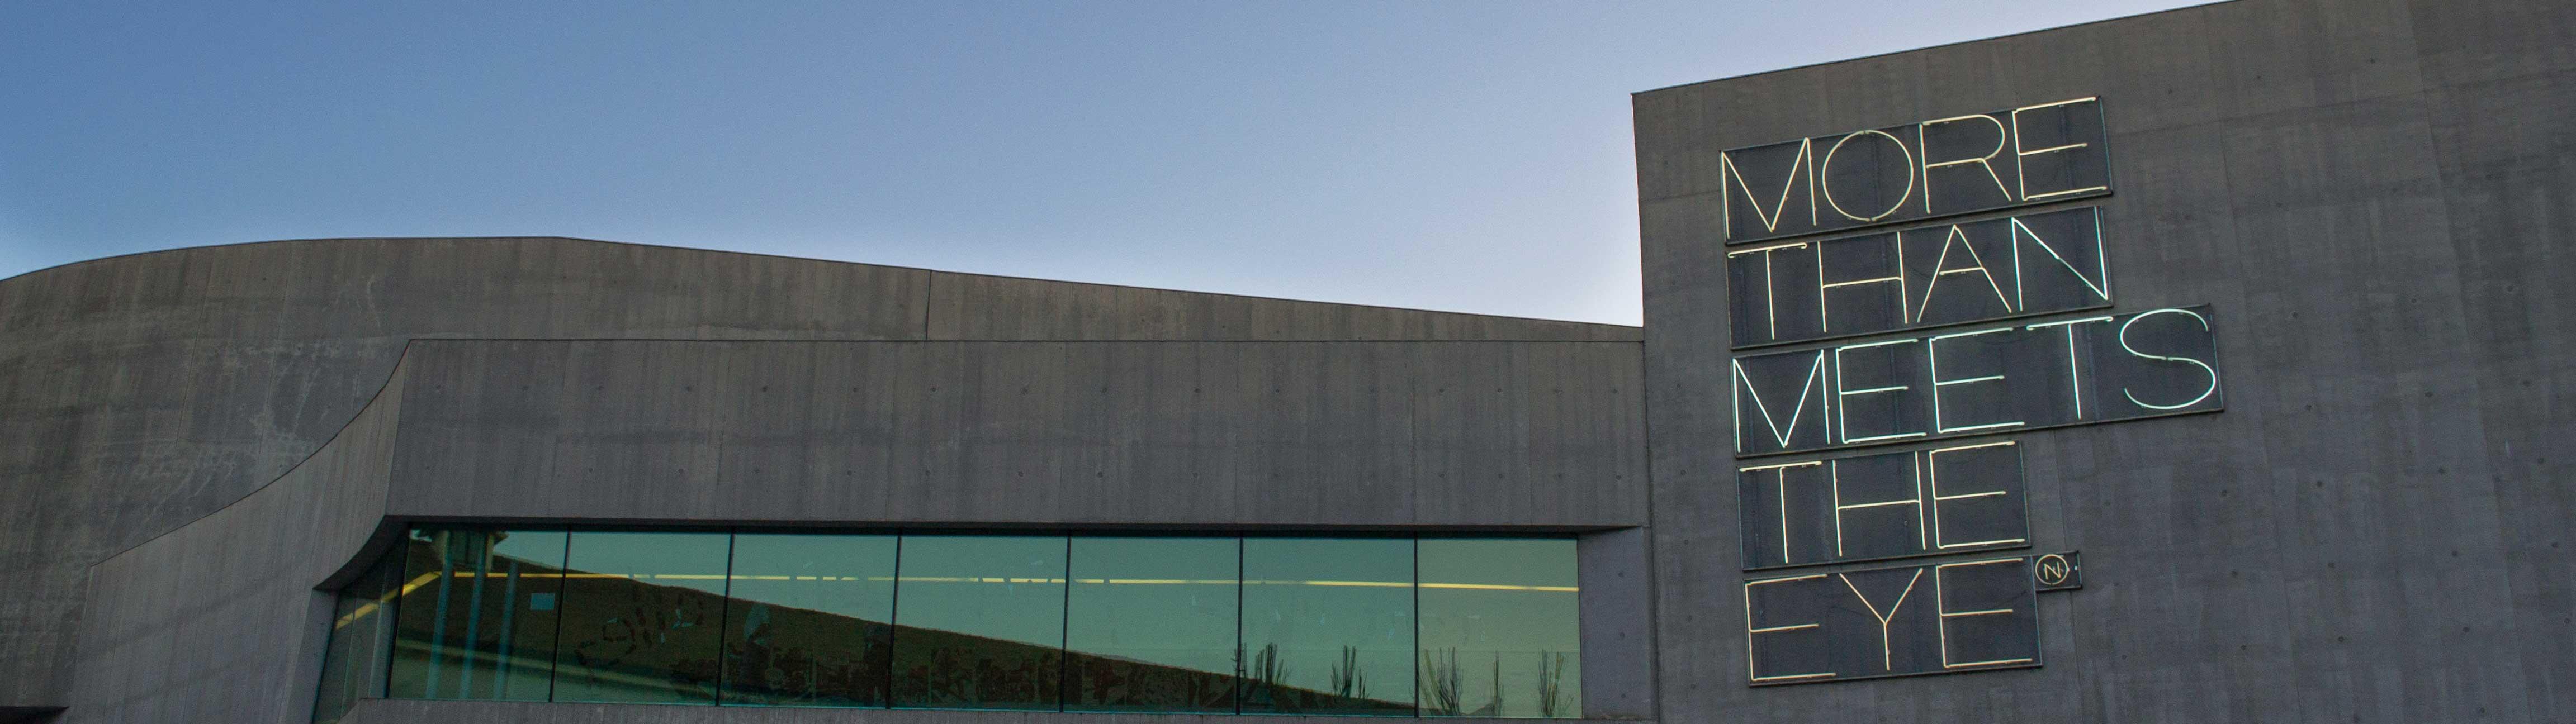 Zaha Hadid Maxxi Rome - C-Rome Architectural Tours